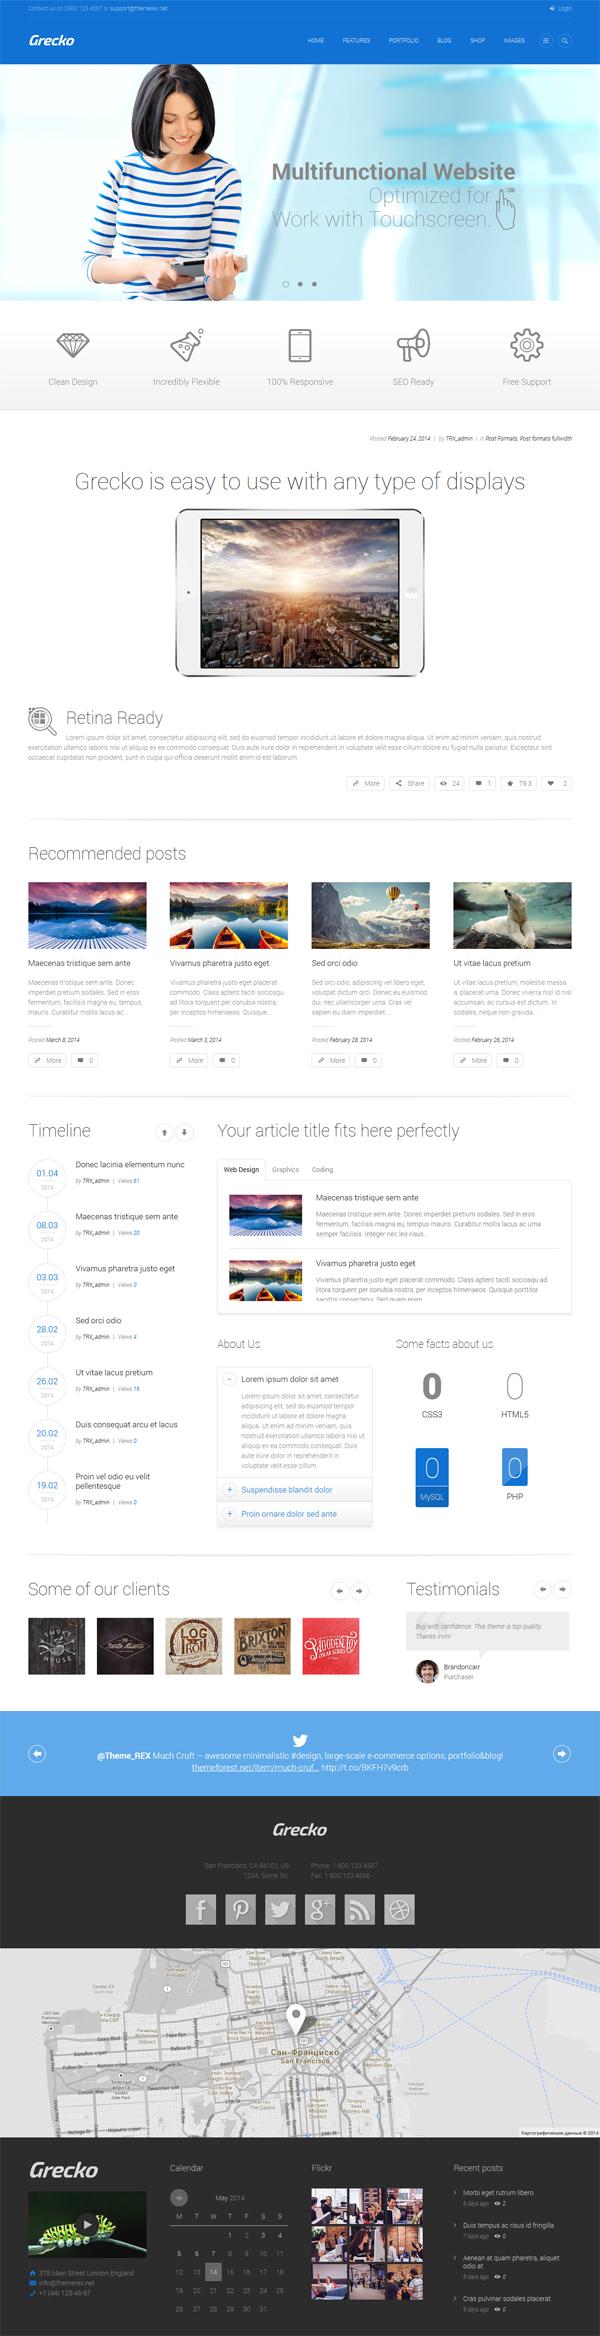 Grecko - Multipurpose Responsive WordPress Theme